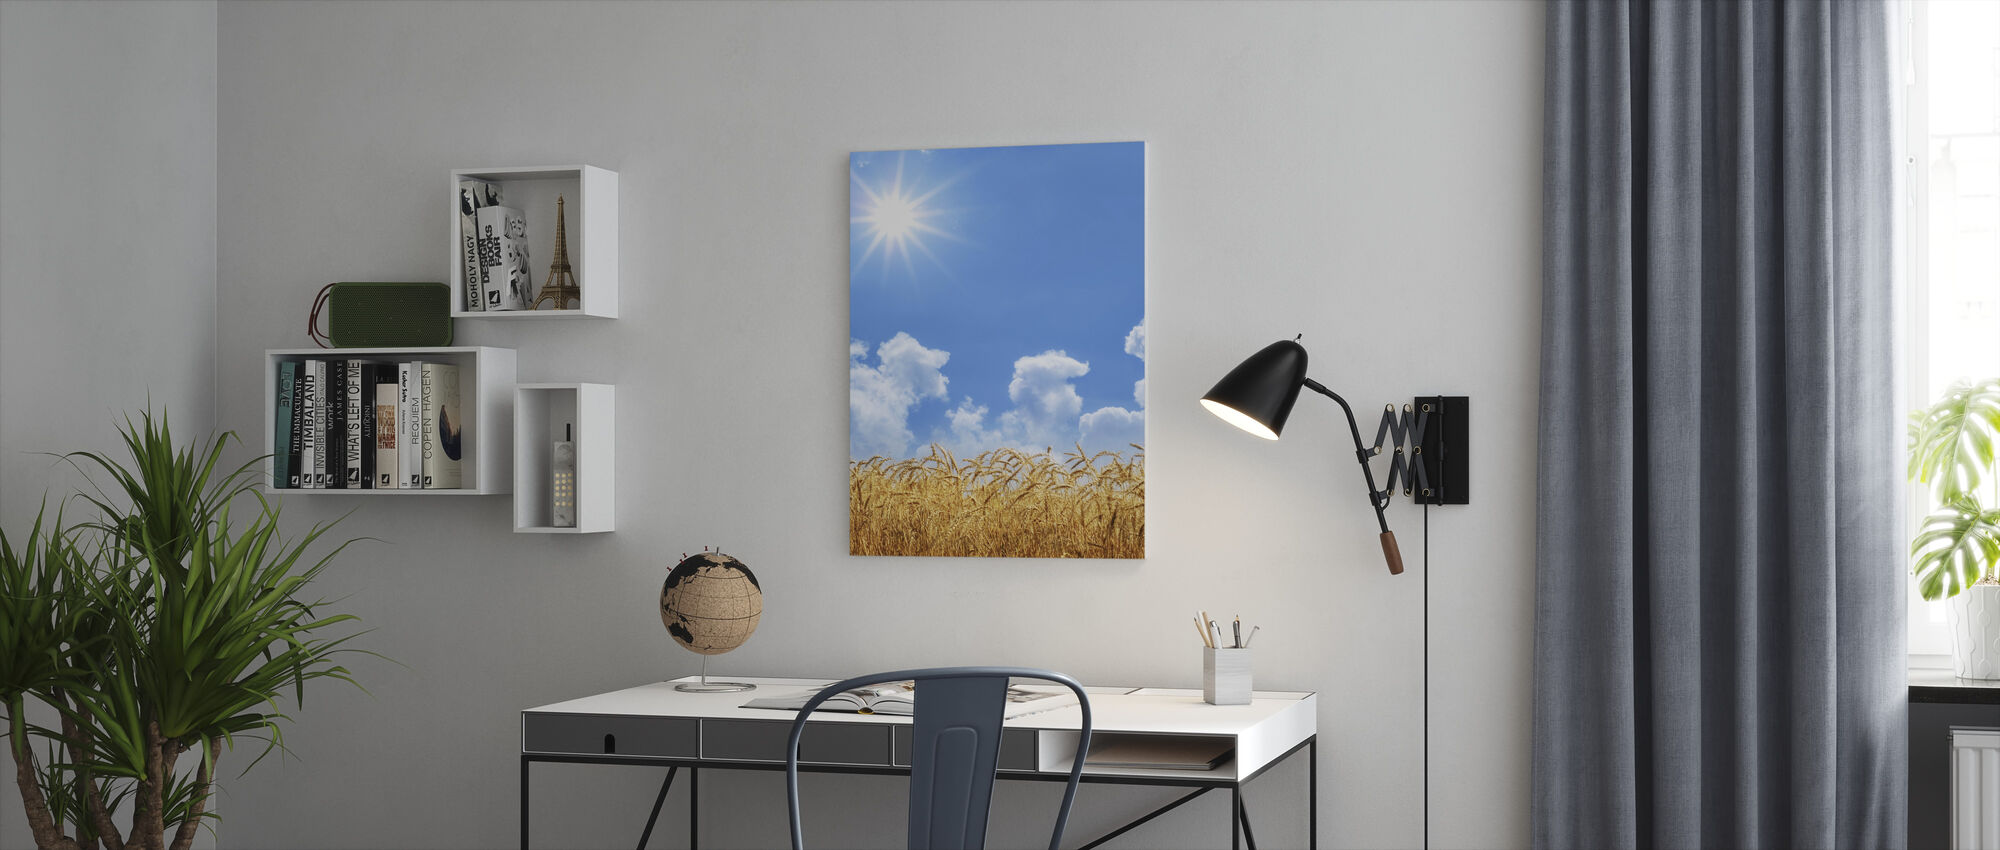 Guld Vete - Canvastavla - Kontor